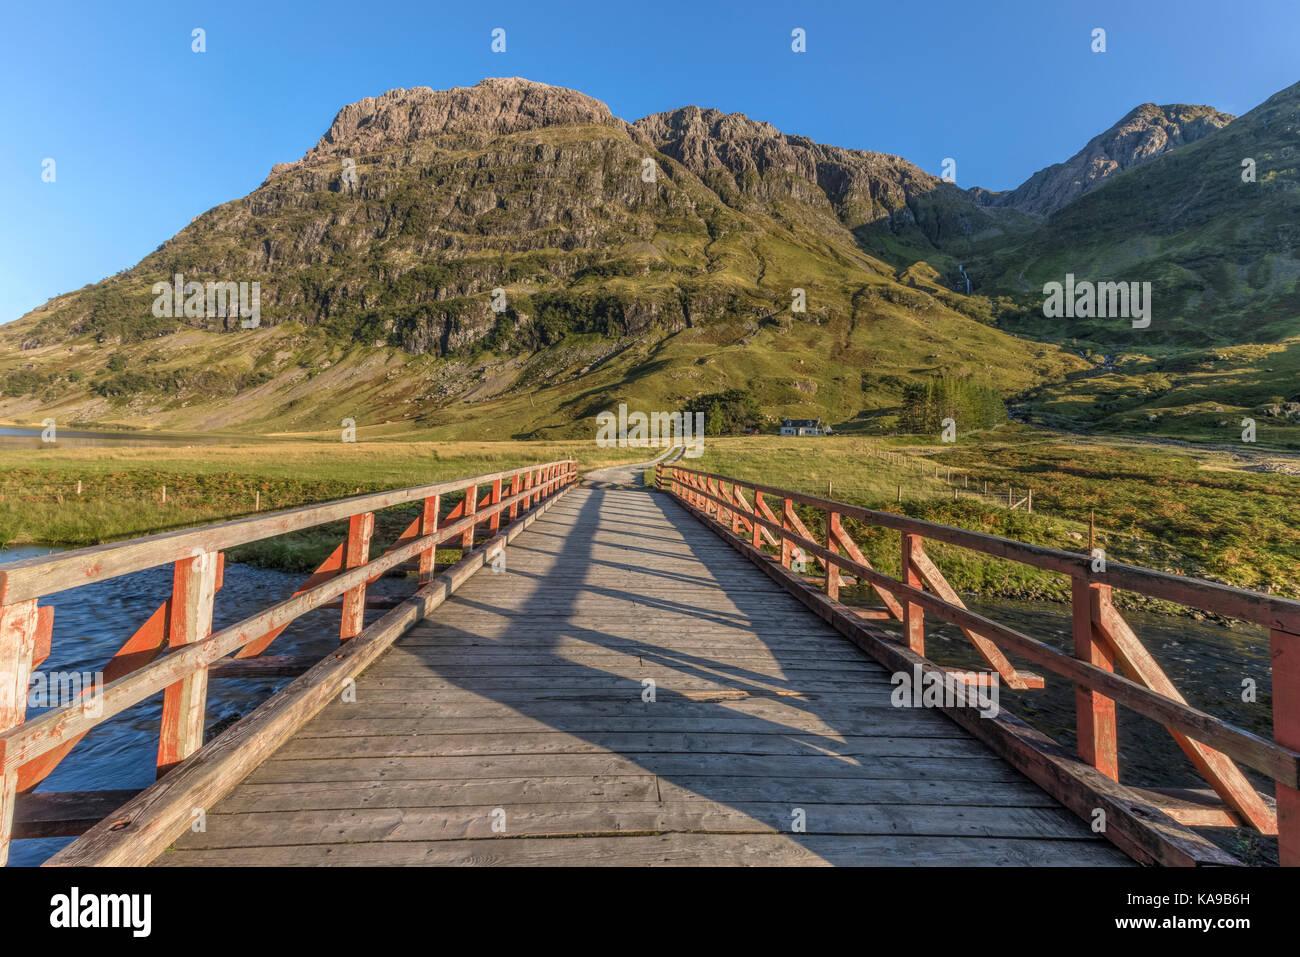 Loch Achtriochtan, Glencoe, Highlands, Scotland, United Kingdom - Stock Image